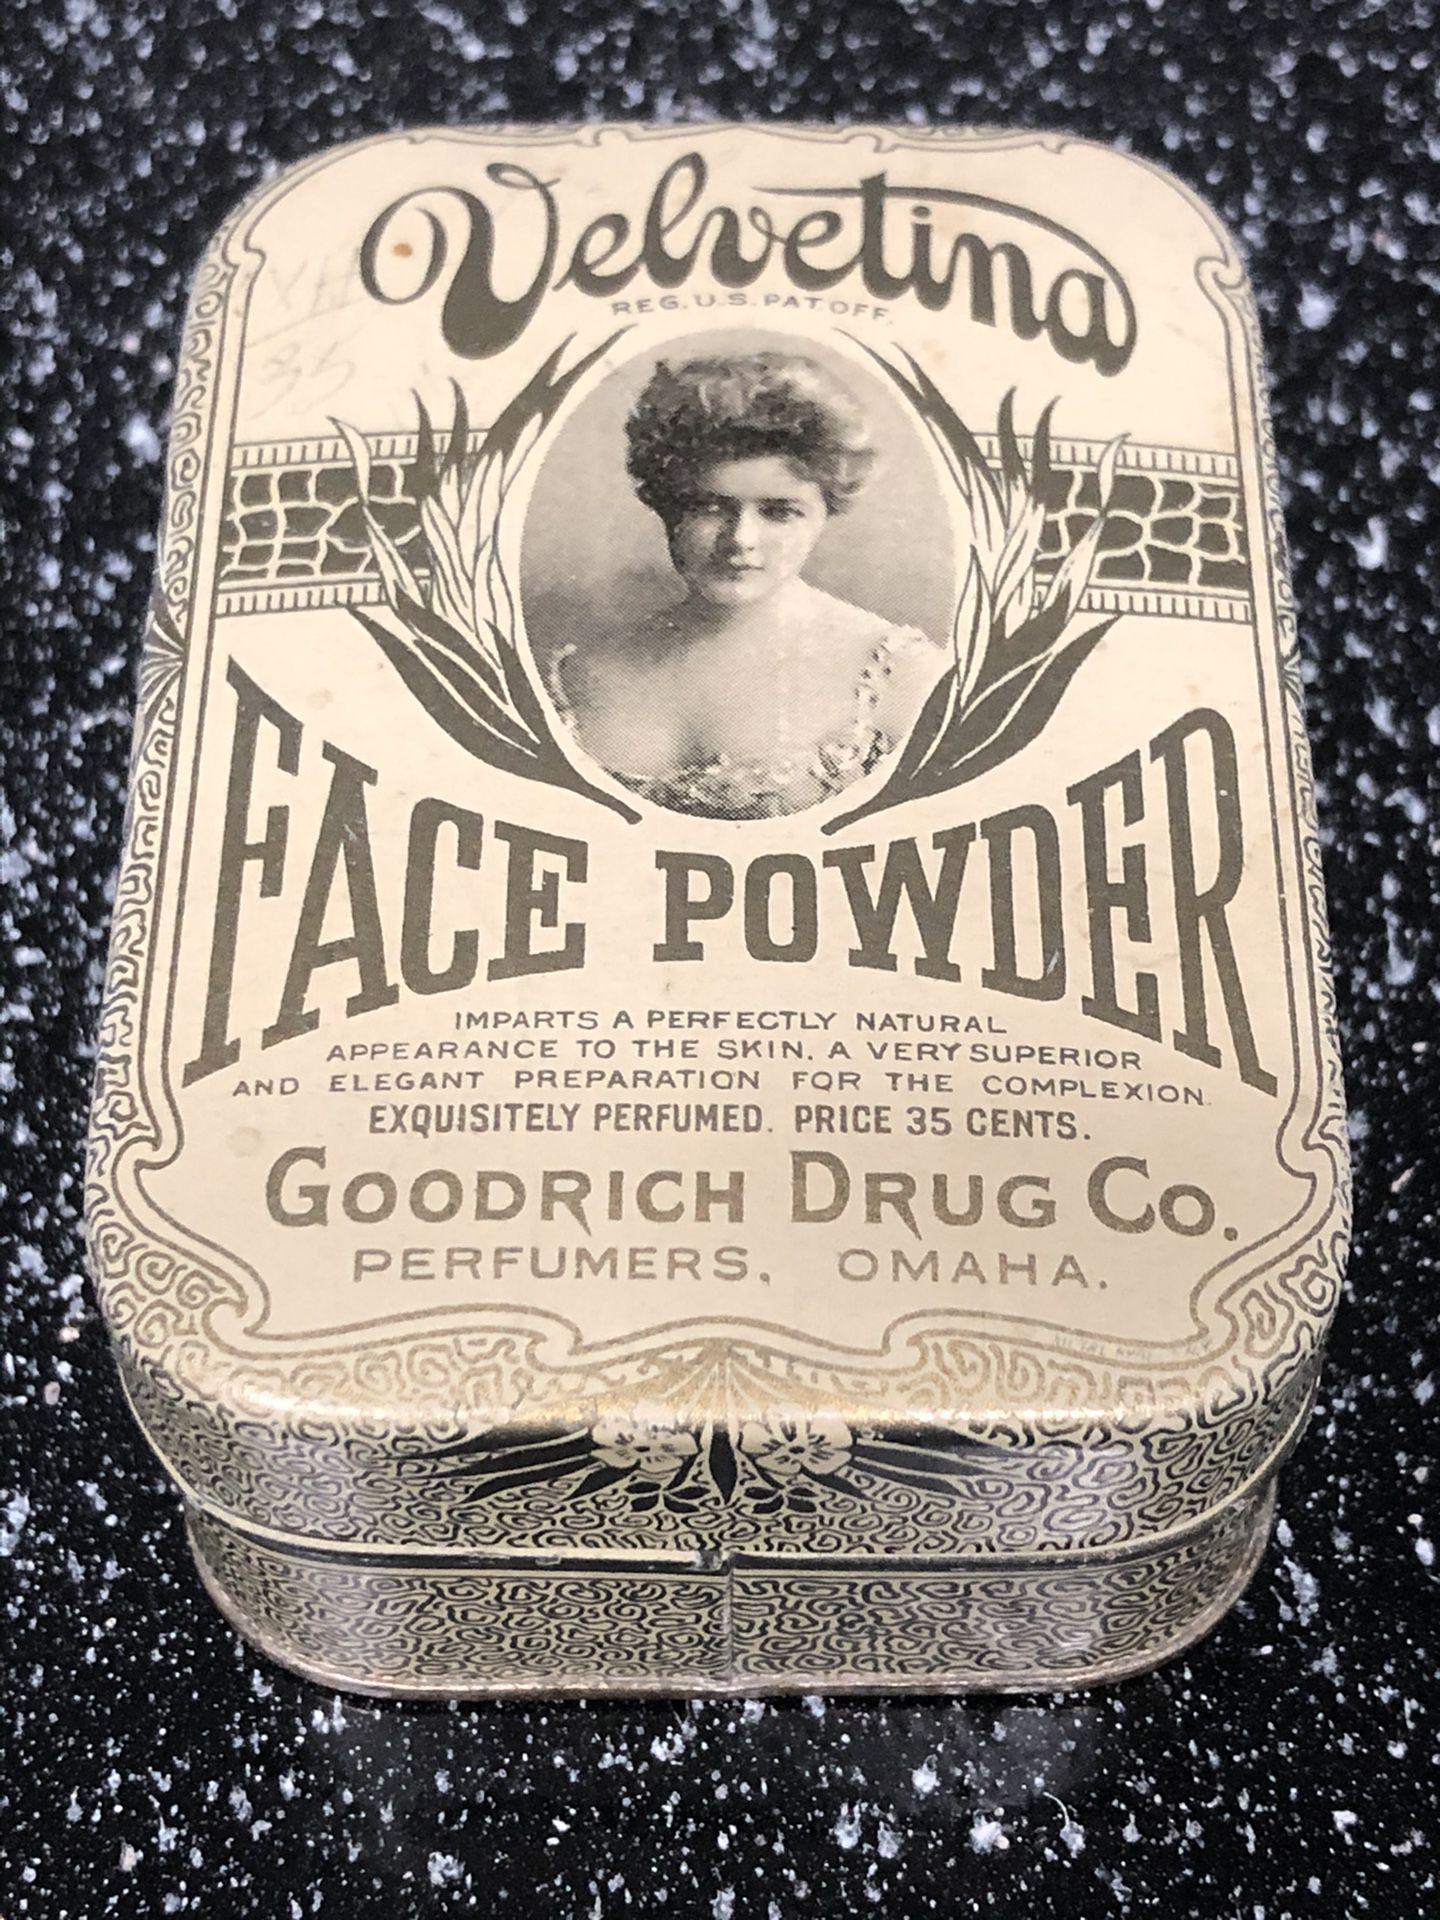 Goodrich Drug Co Vintage